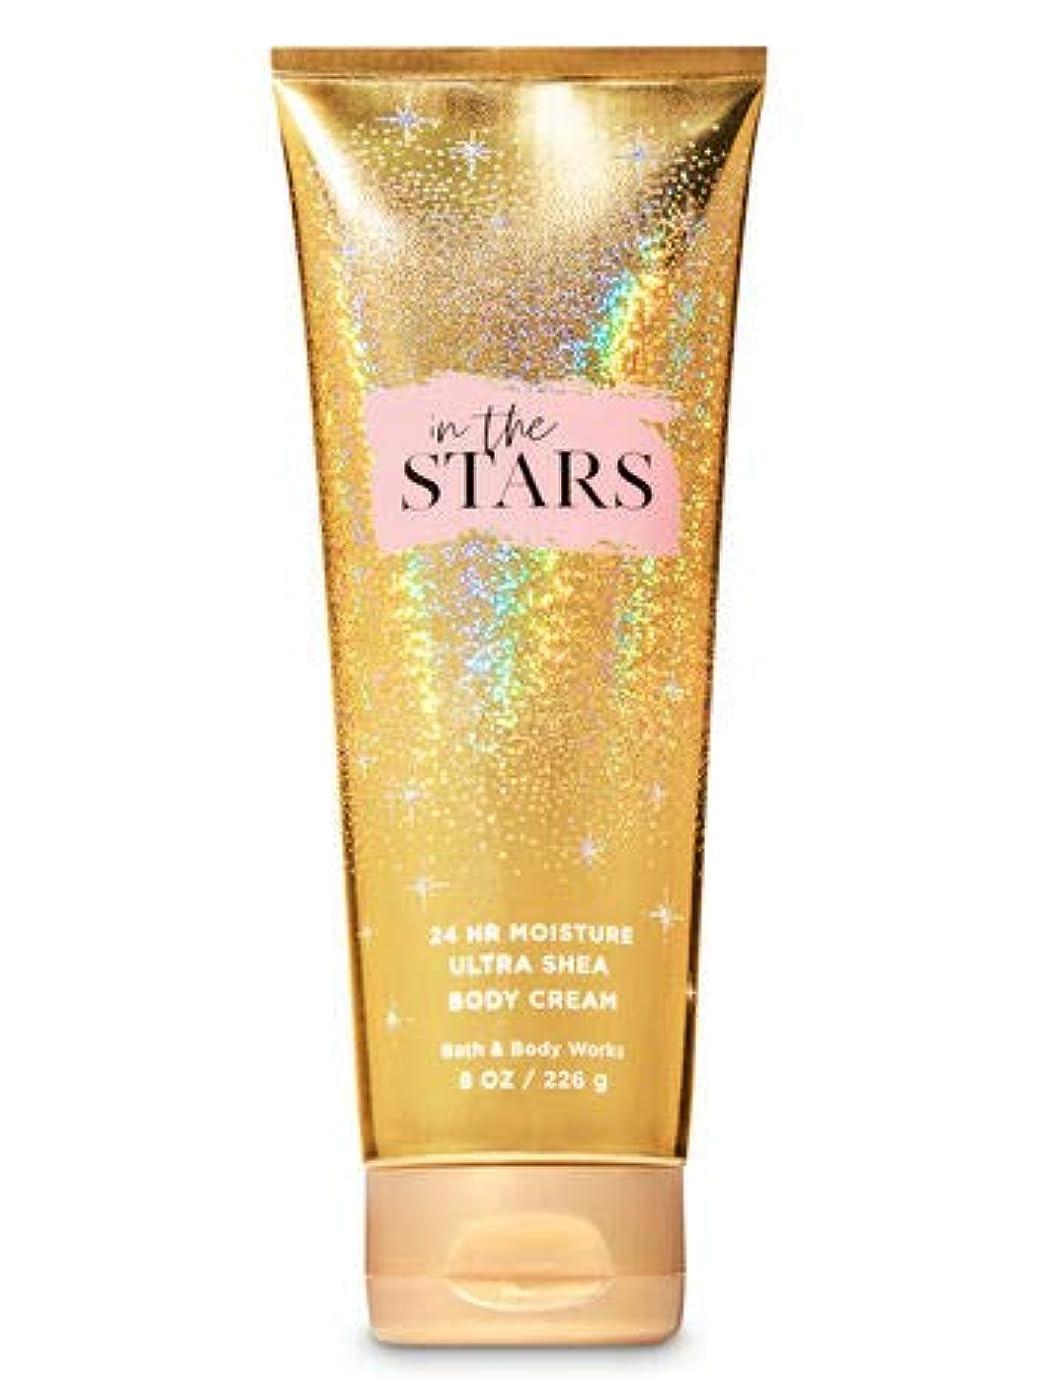 Bath & Body Works インザ スターズ in the Stars ボディクリーム ULTRA SHEA バス&ボディワークス [並行輸入品]